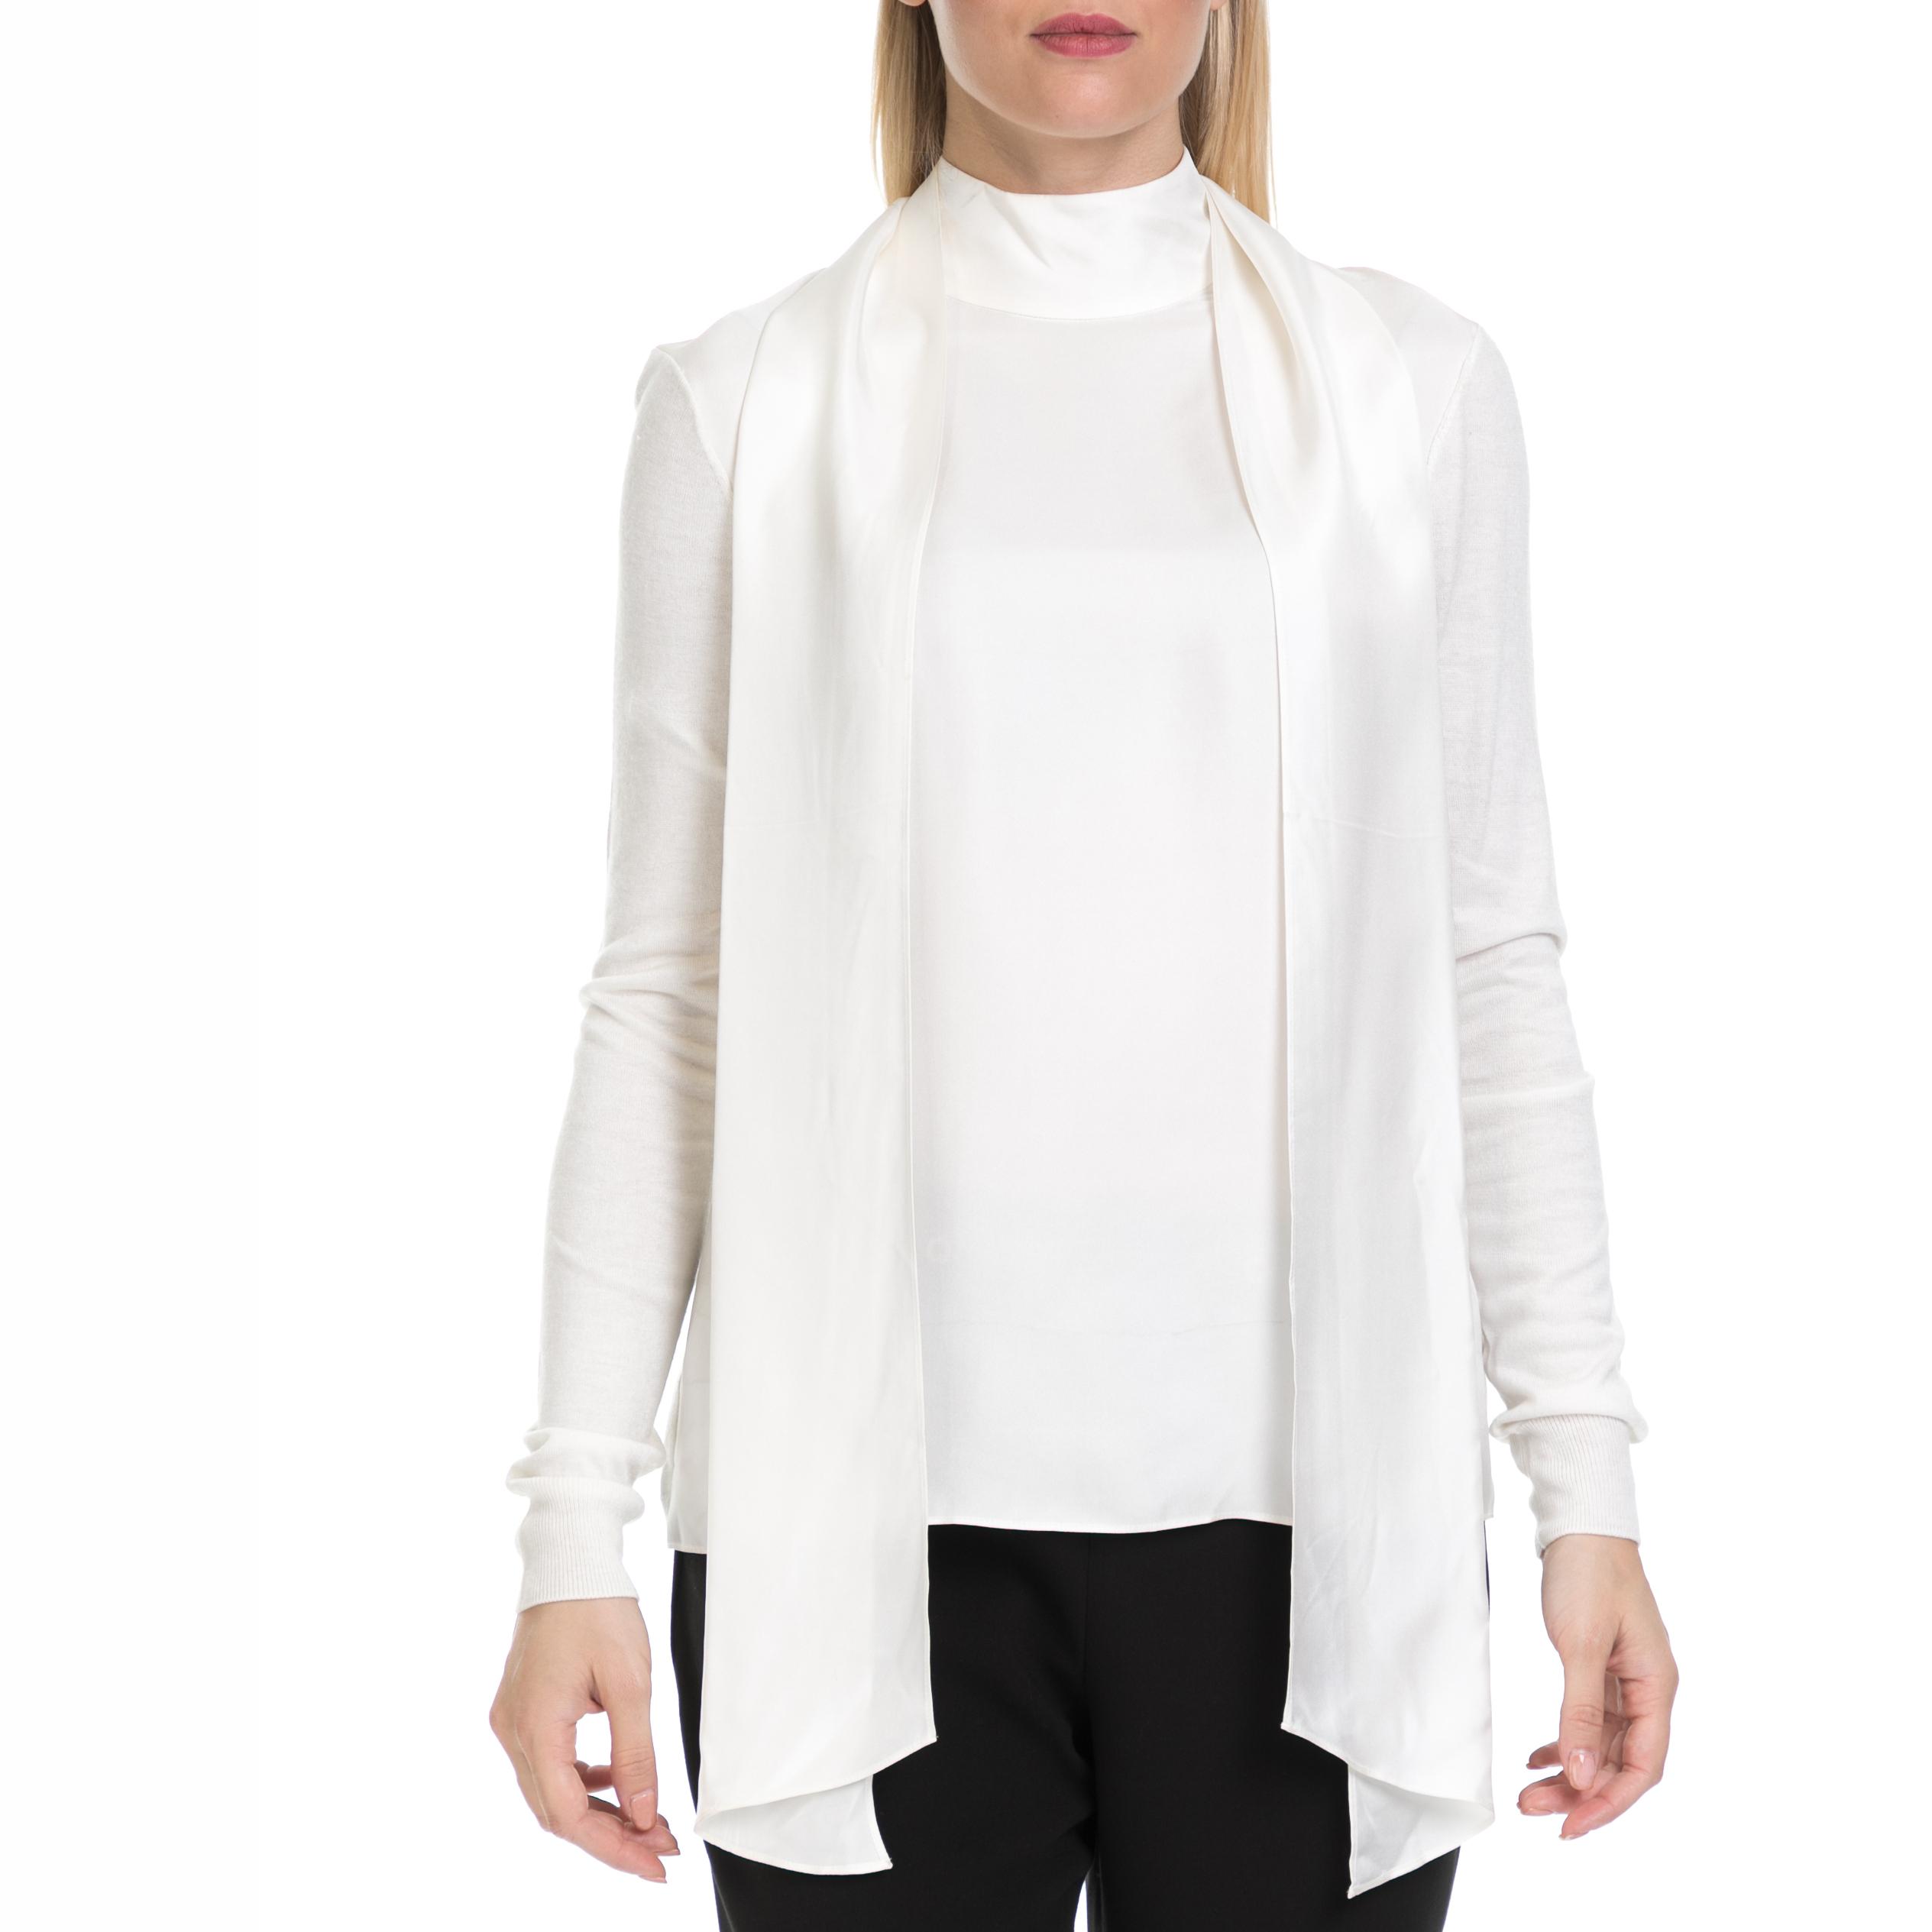 TED BAKER – Γυναικεία μπλούζα BABRI TED BAKER λευκή